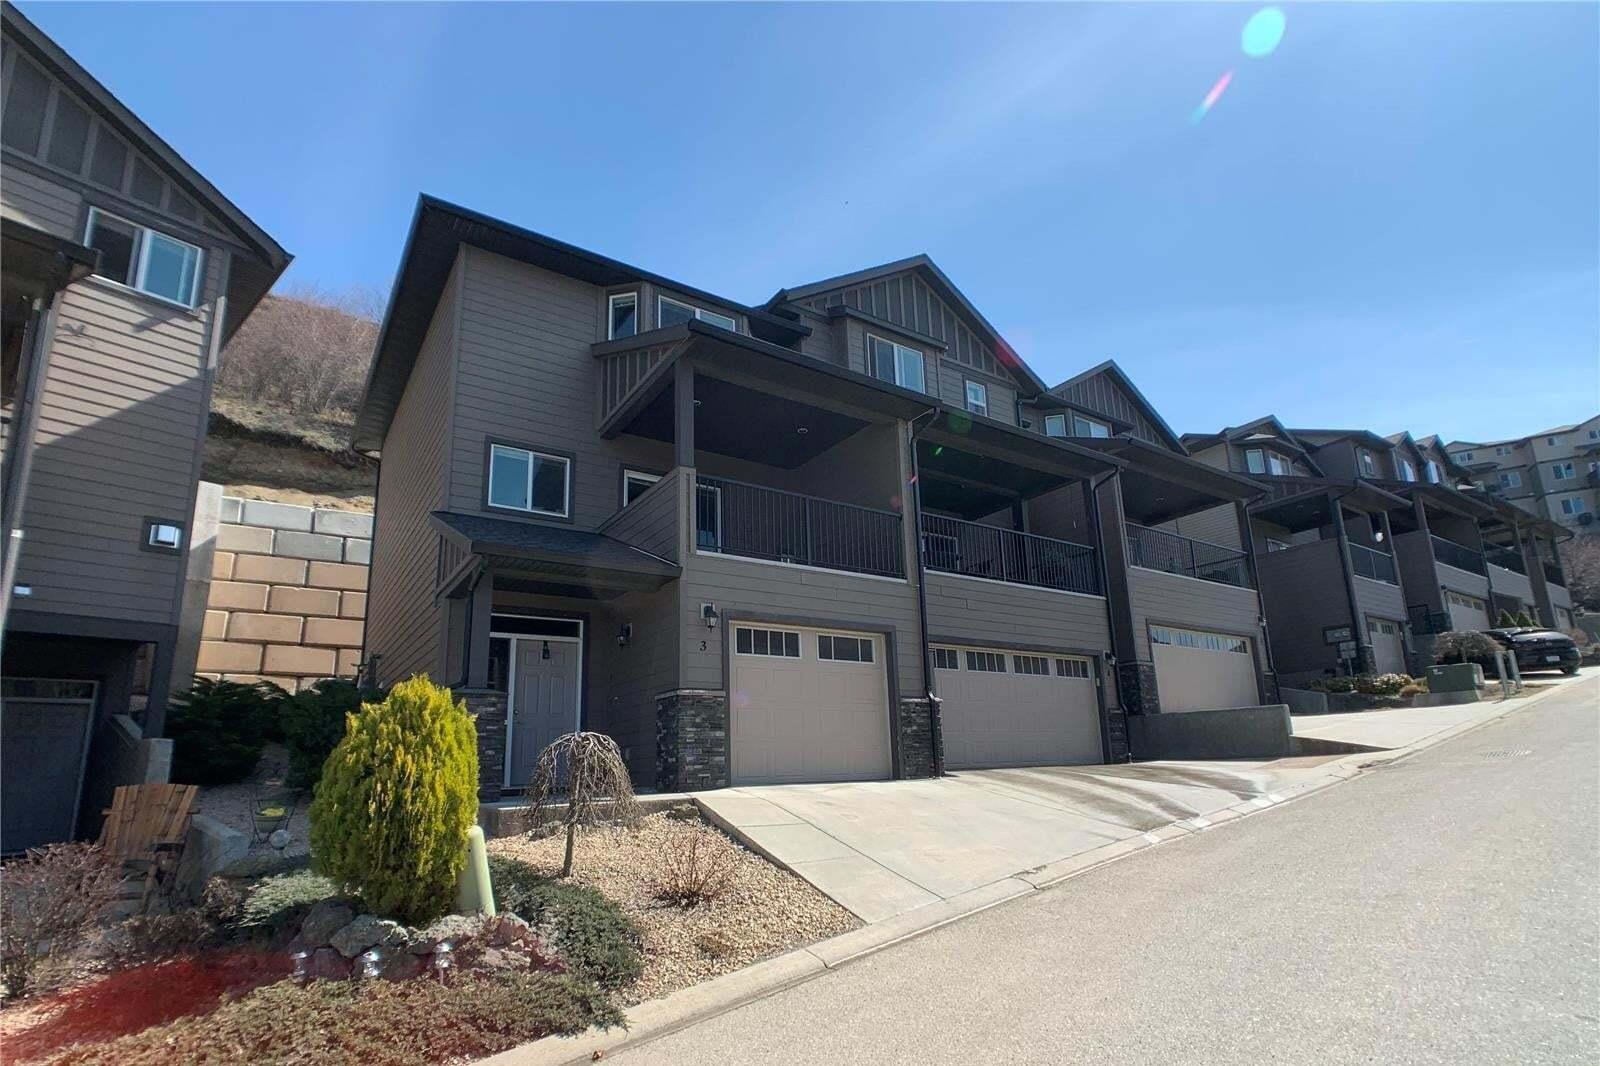 Townhouse for sale at 995 Mt. Ida Dr Vernon British Columbia - MLS: 10206927